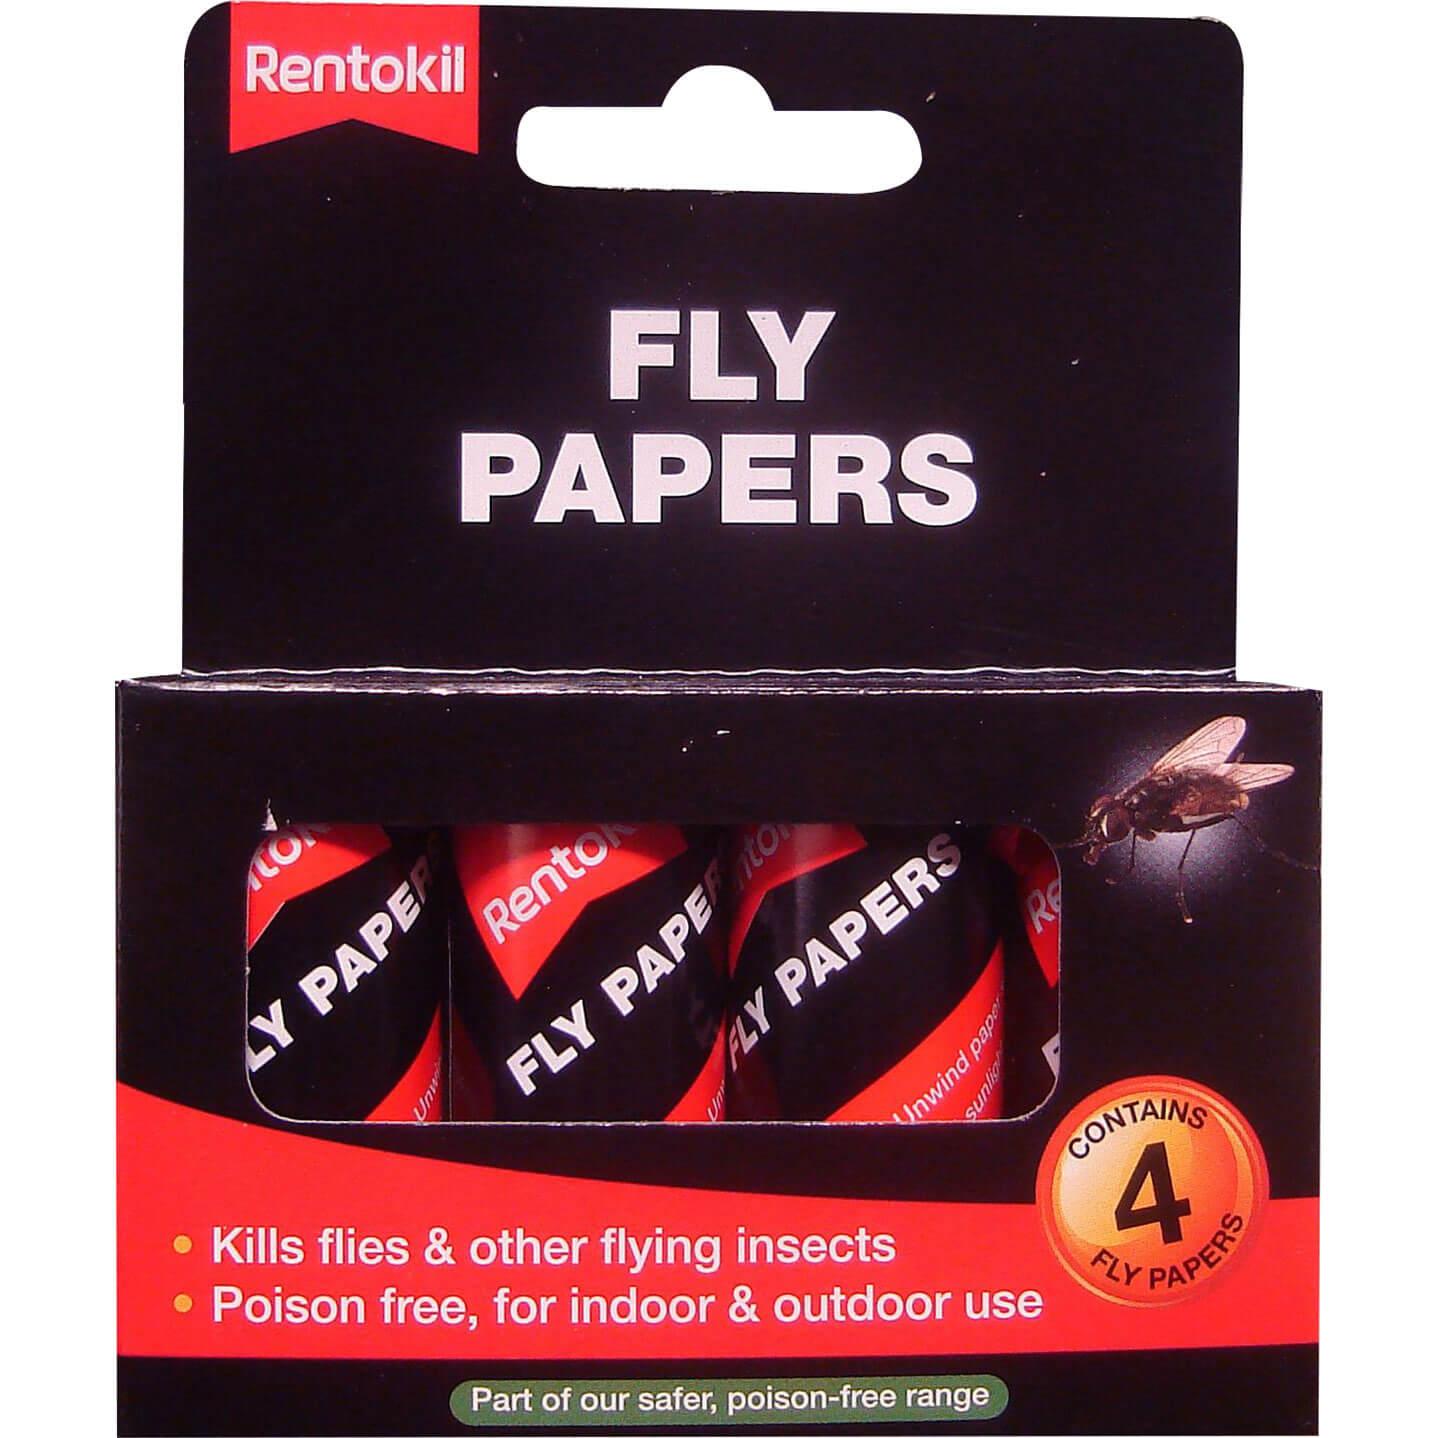 Image of Rentokil Flypapers Pack of 4